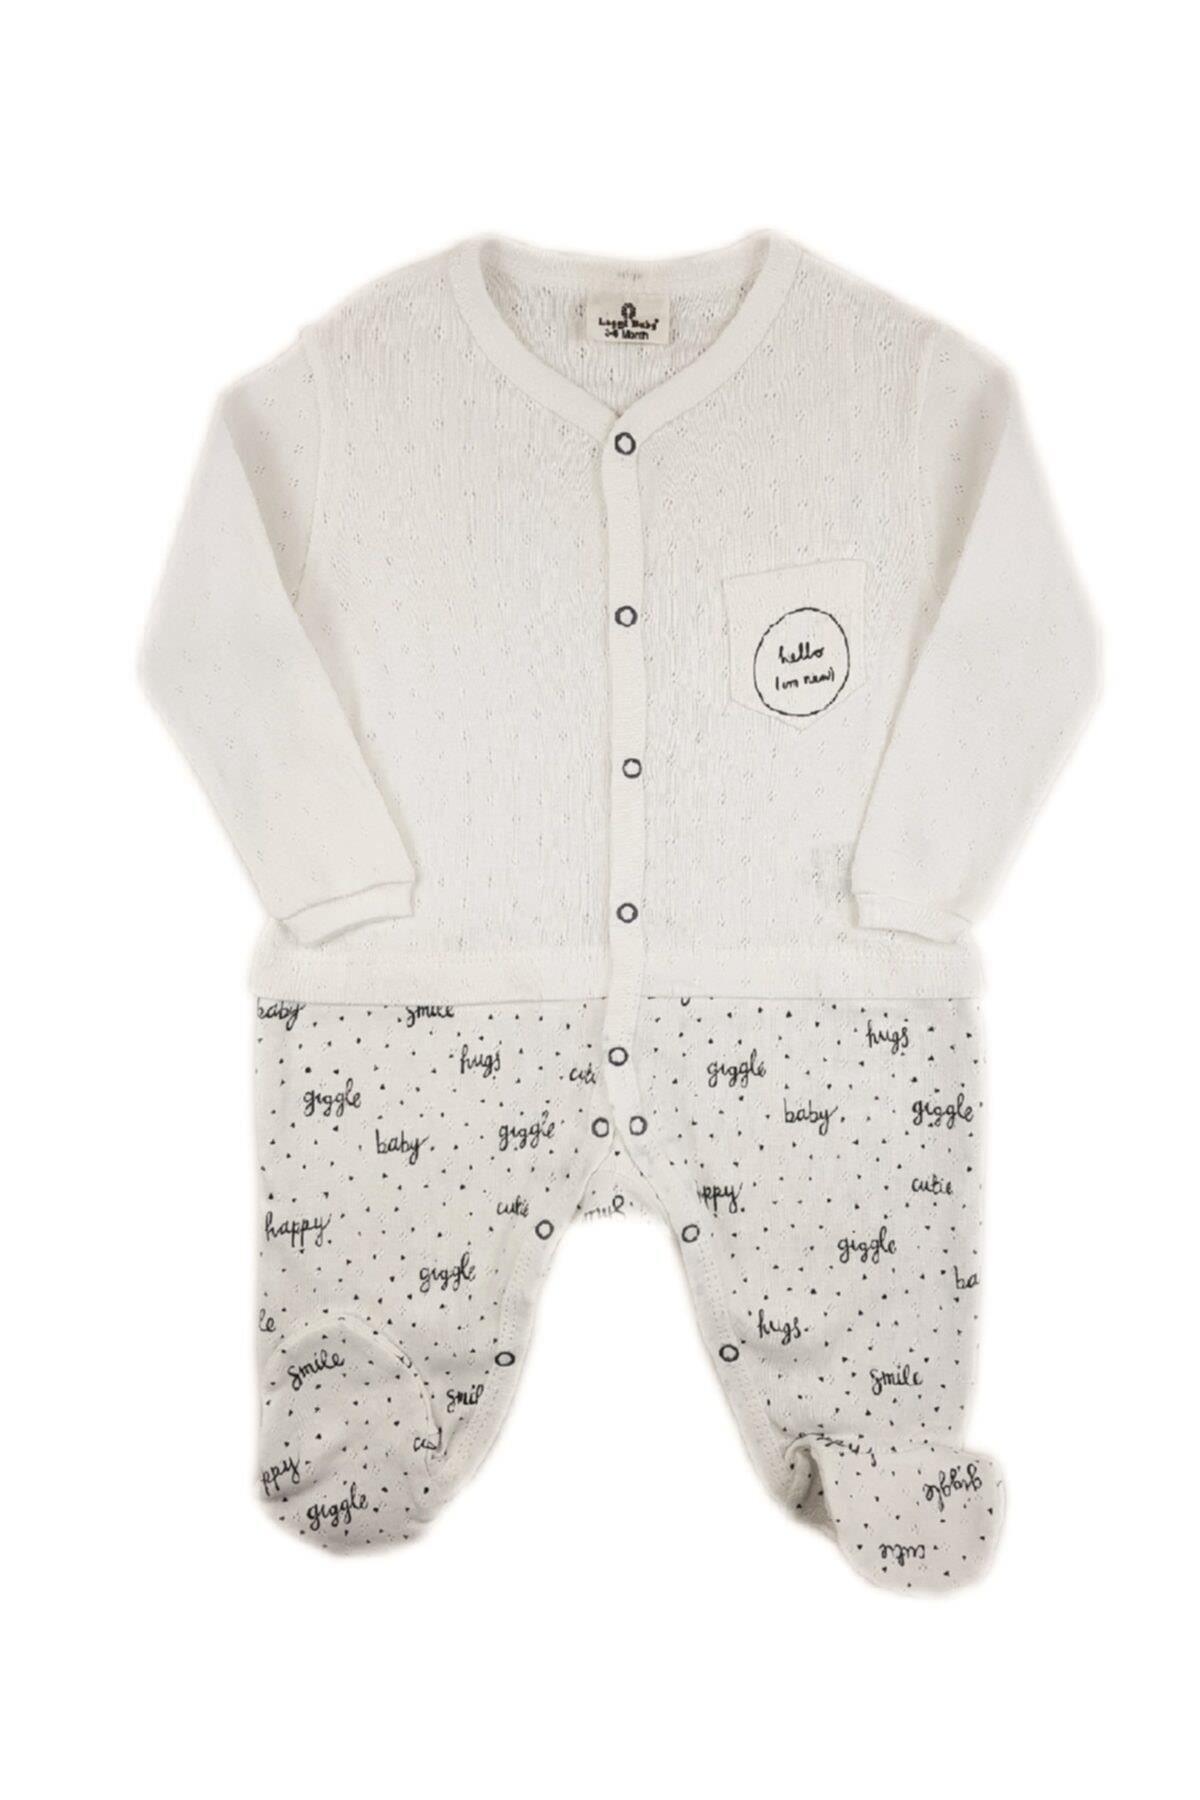 Luggi Baby Patikli Bebe Tulum 5066 Orjinal